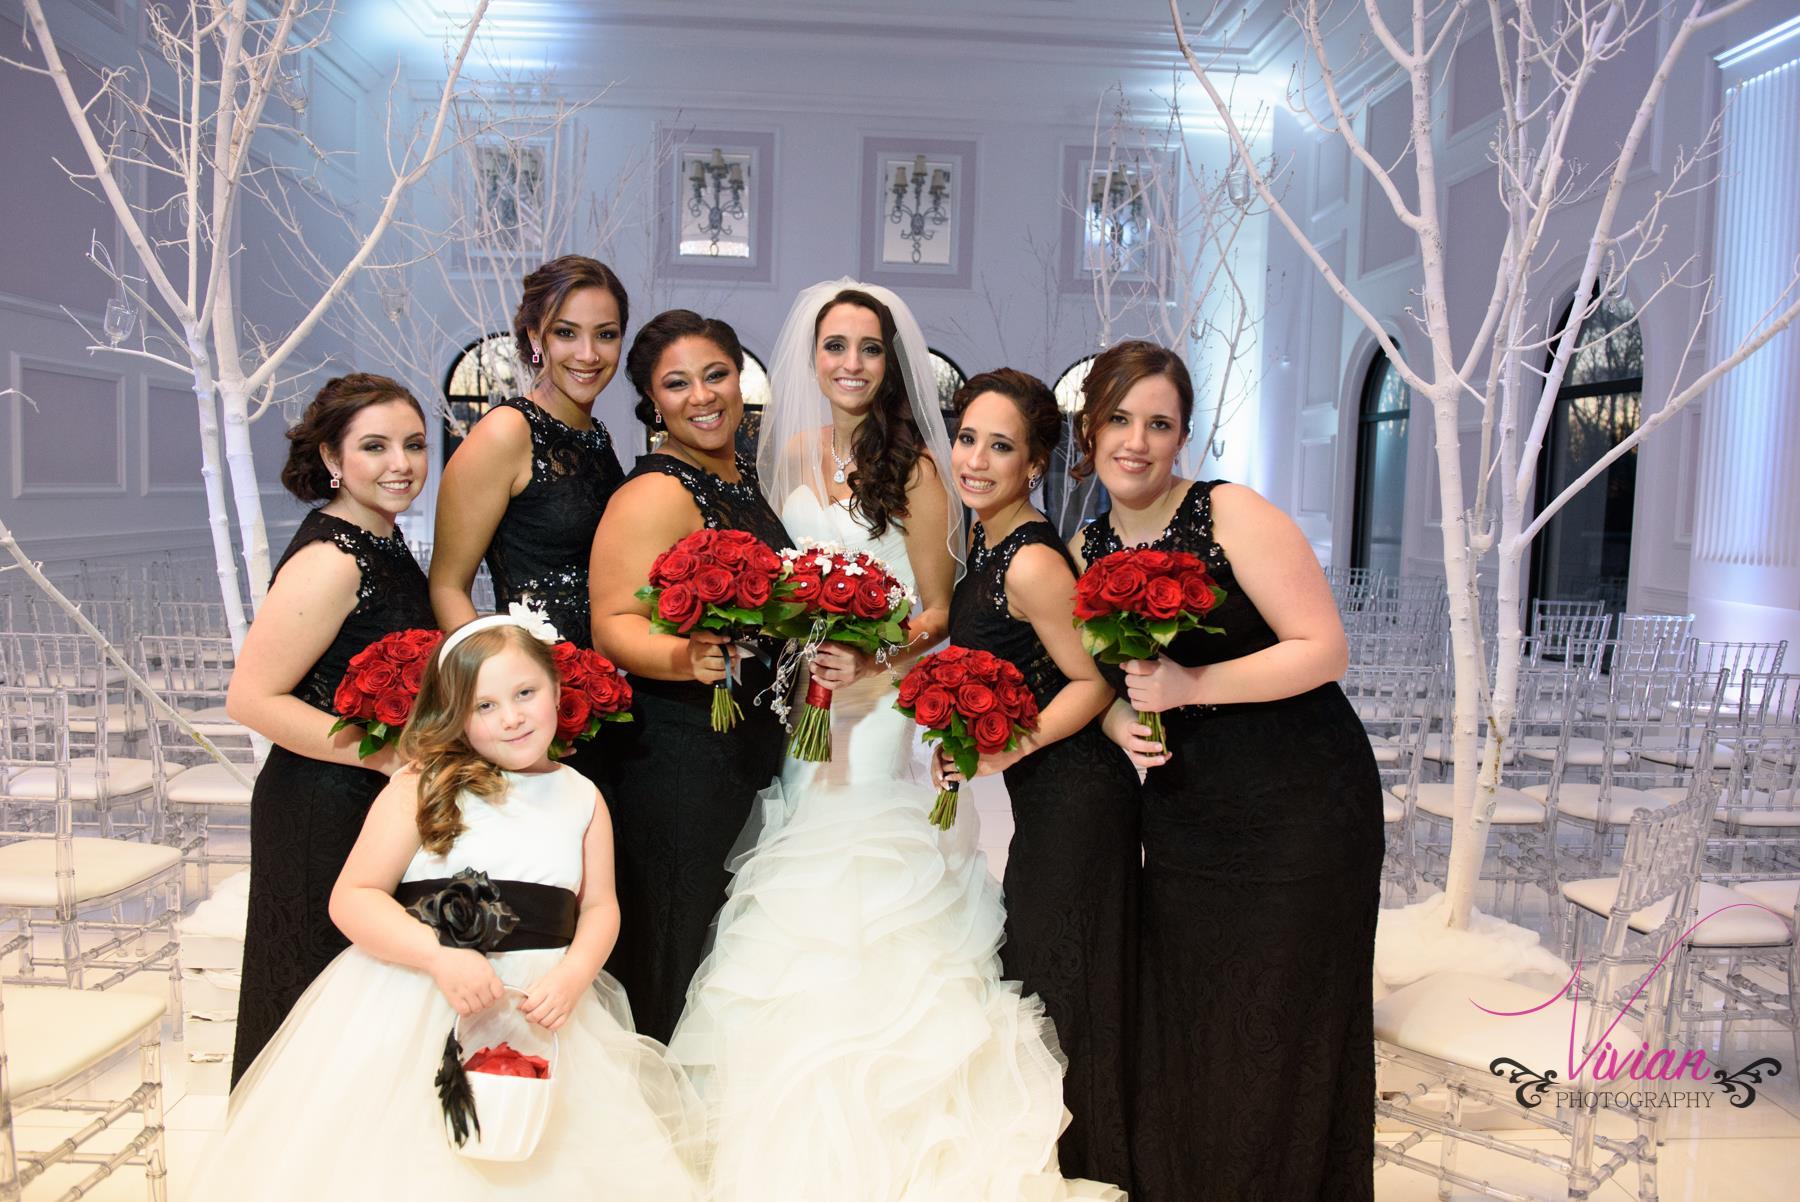 bride-posing-with-bridesmaids-in-winter-wedding-theme.jpg